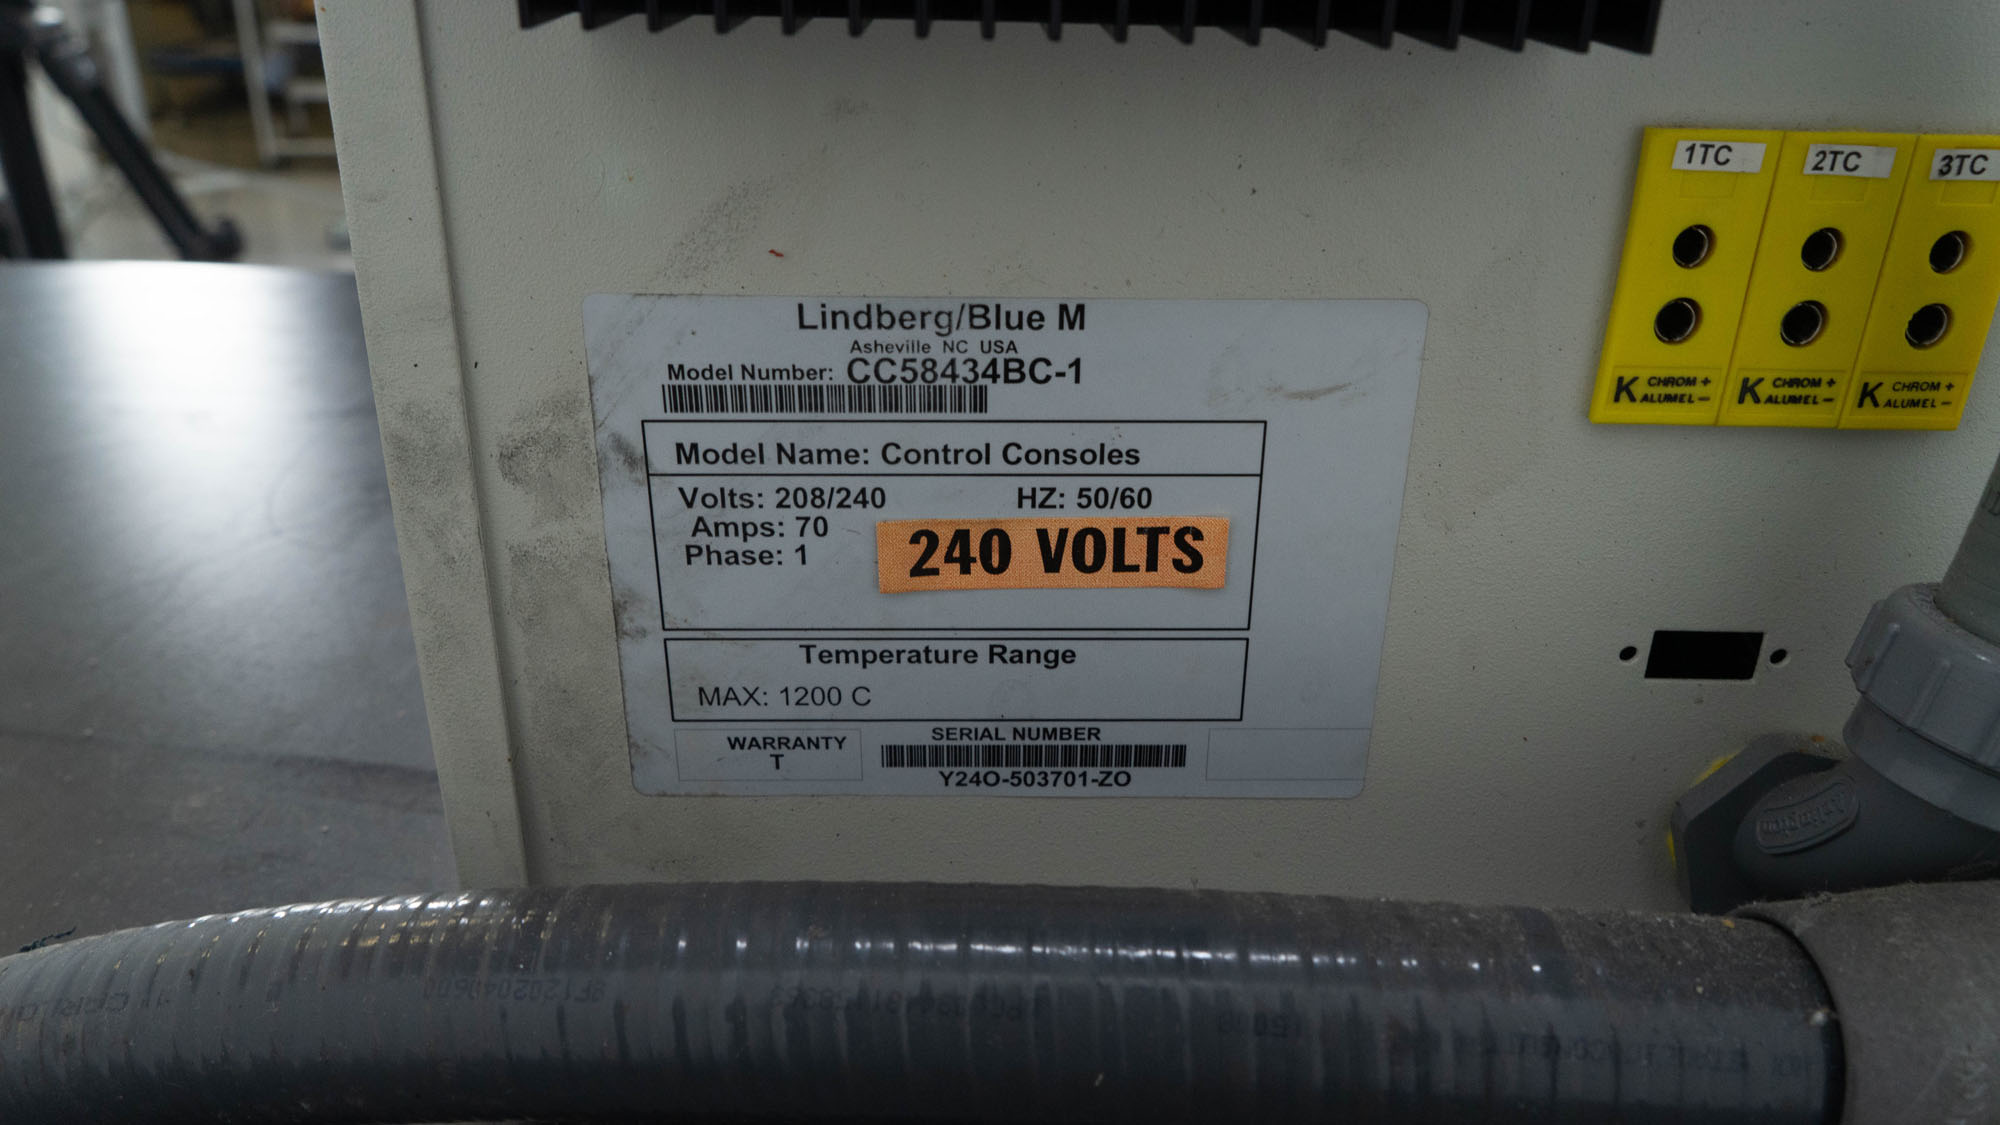 Lindberg/Blue M Control Console, Model CC58434BC-1